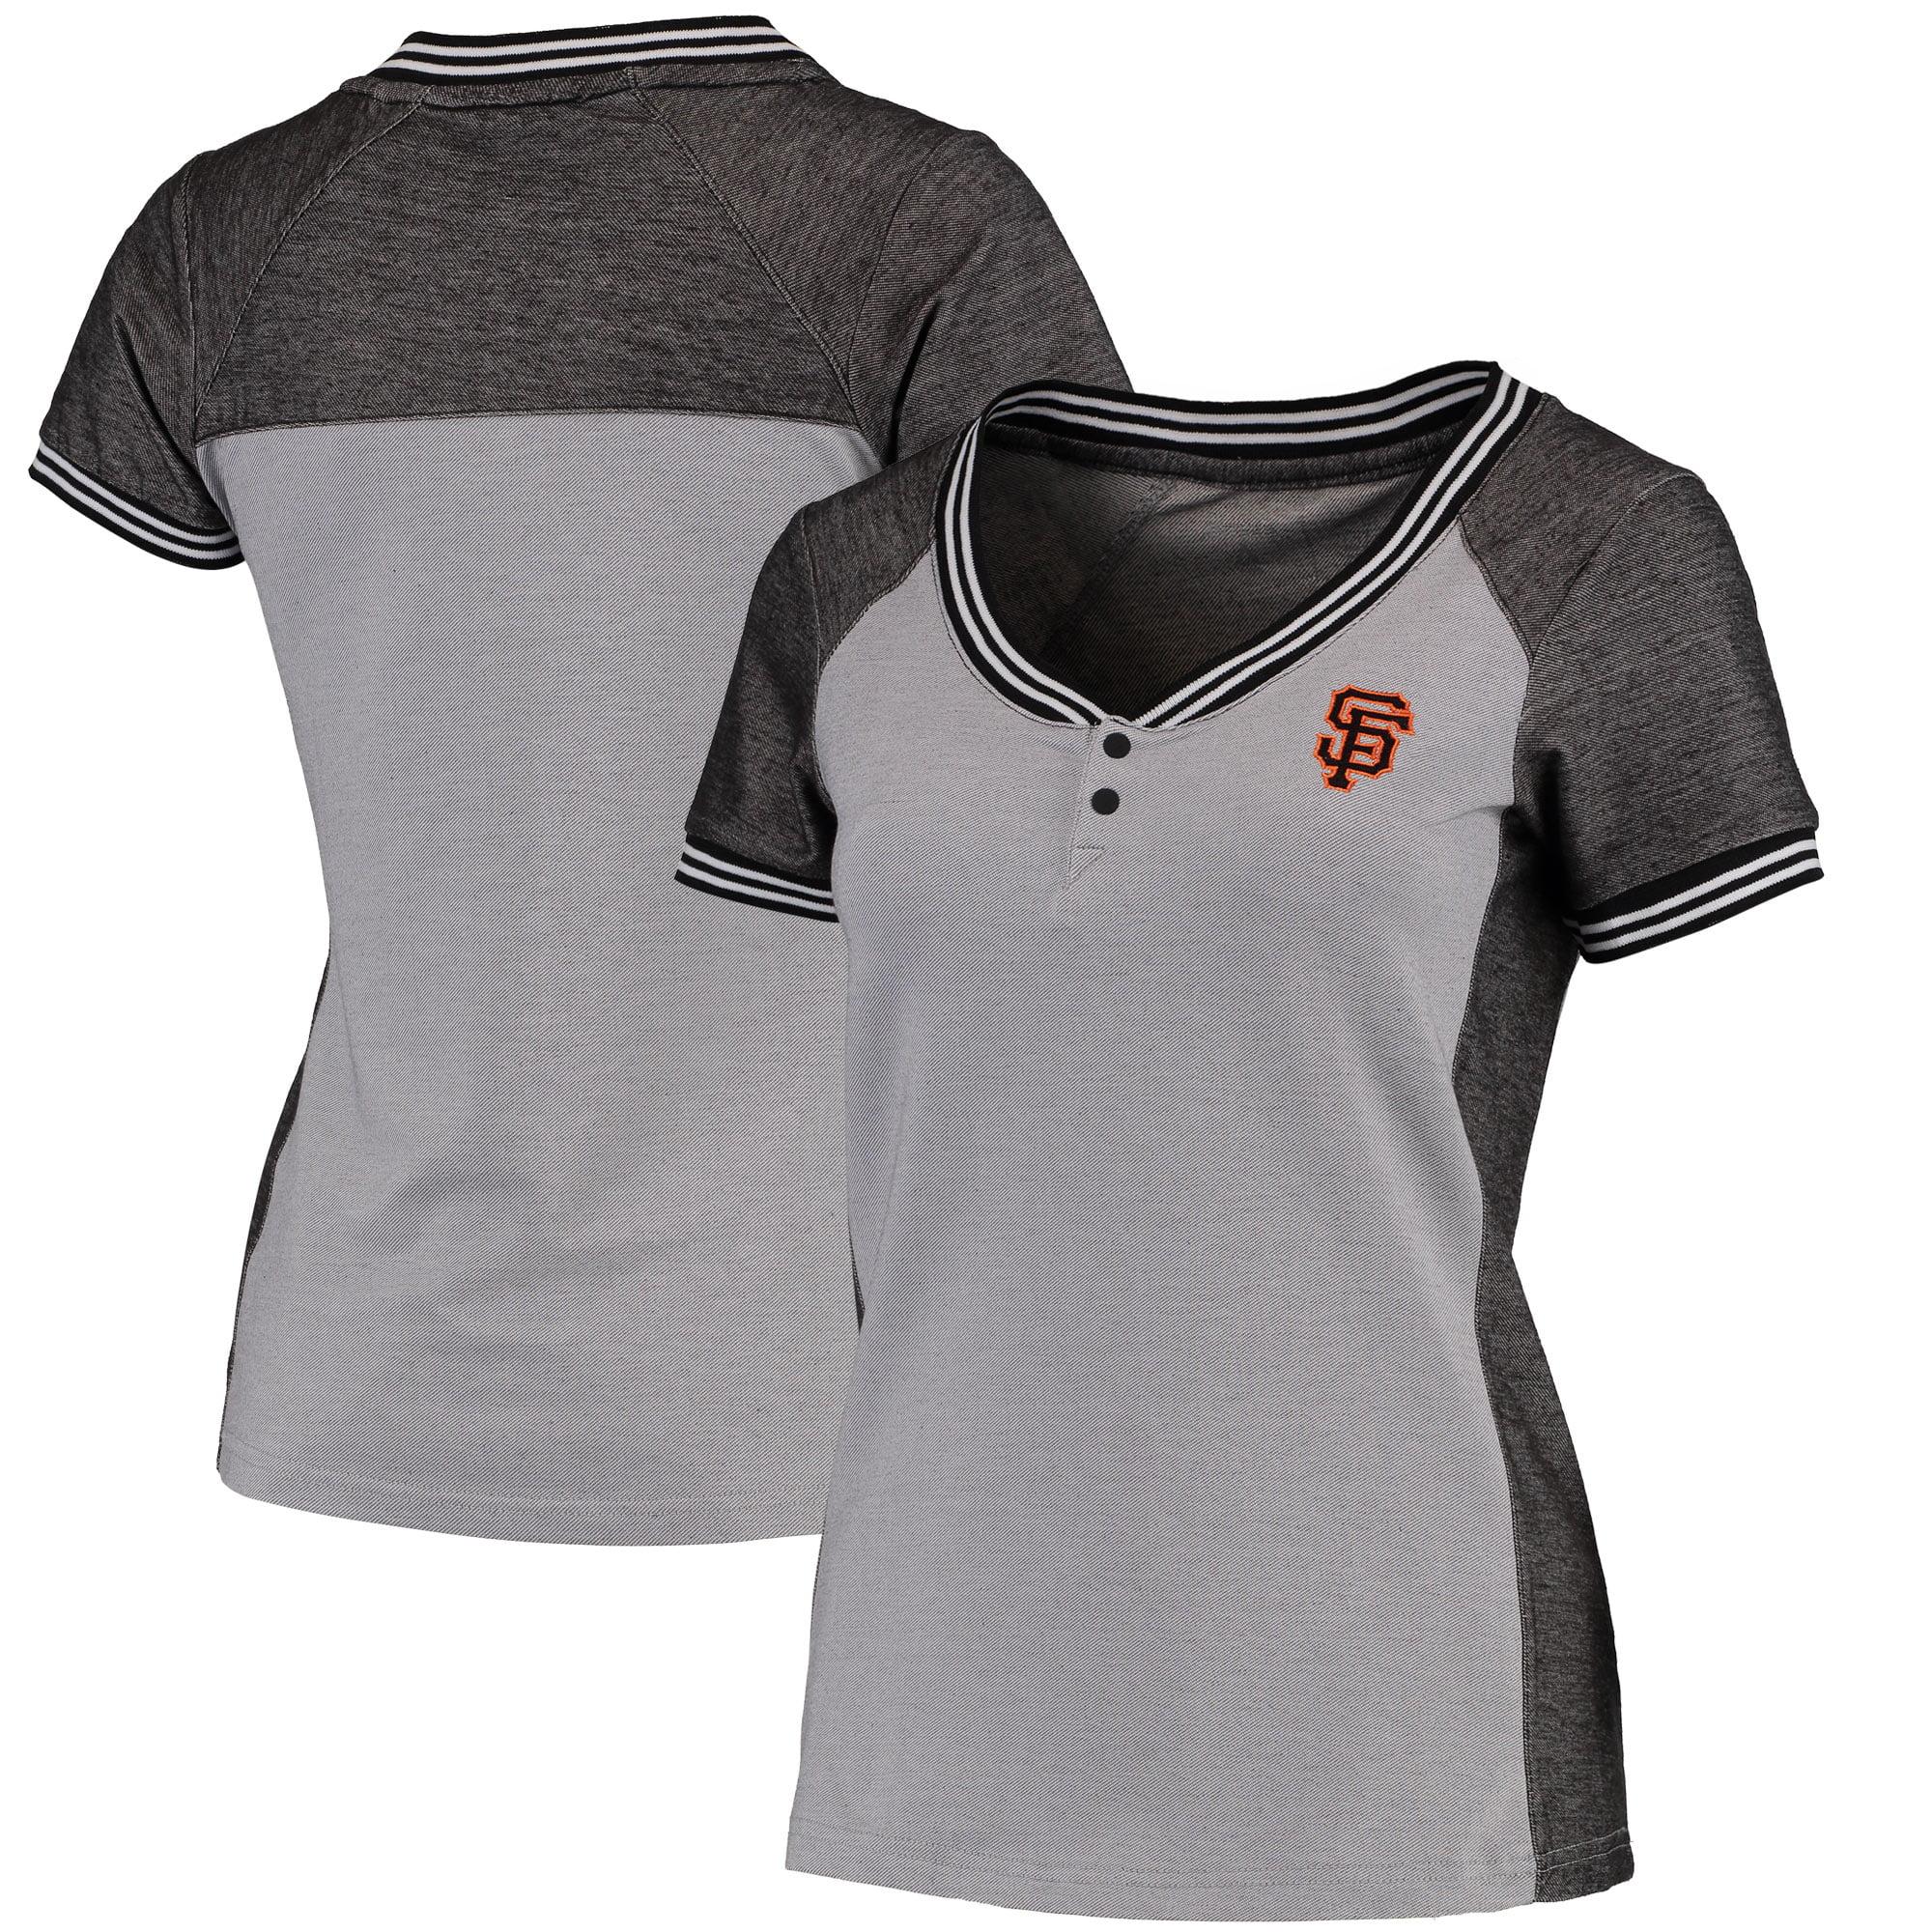 San Francisco Giants Antigua Women's Quick Henley T-Shirt - Gray/Black